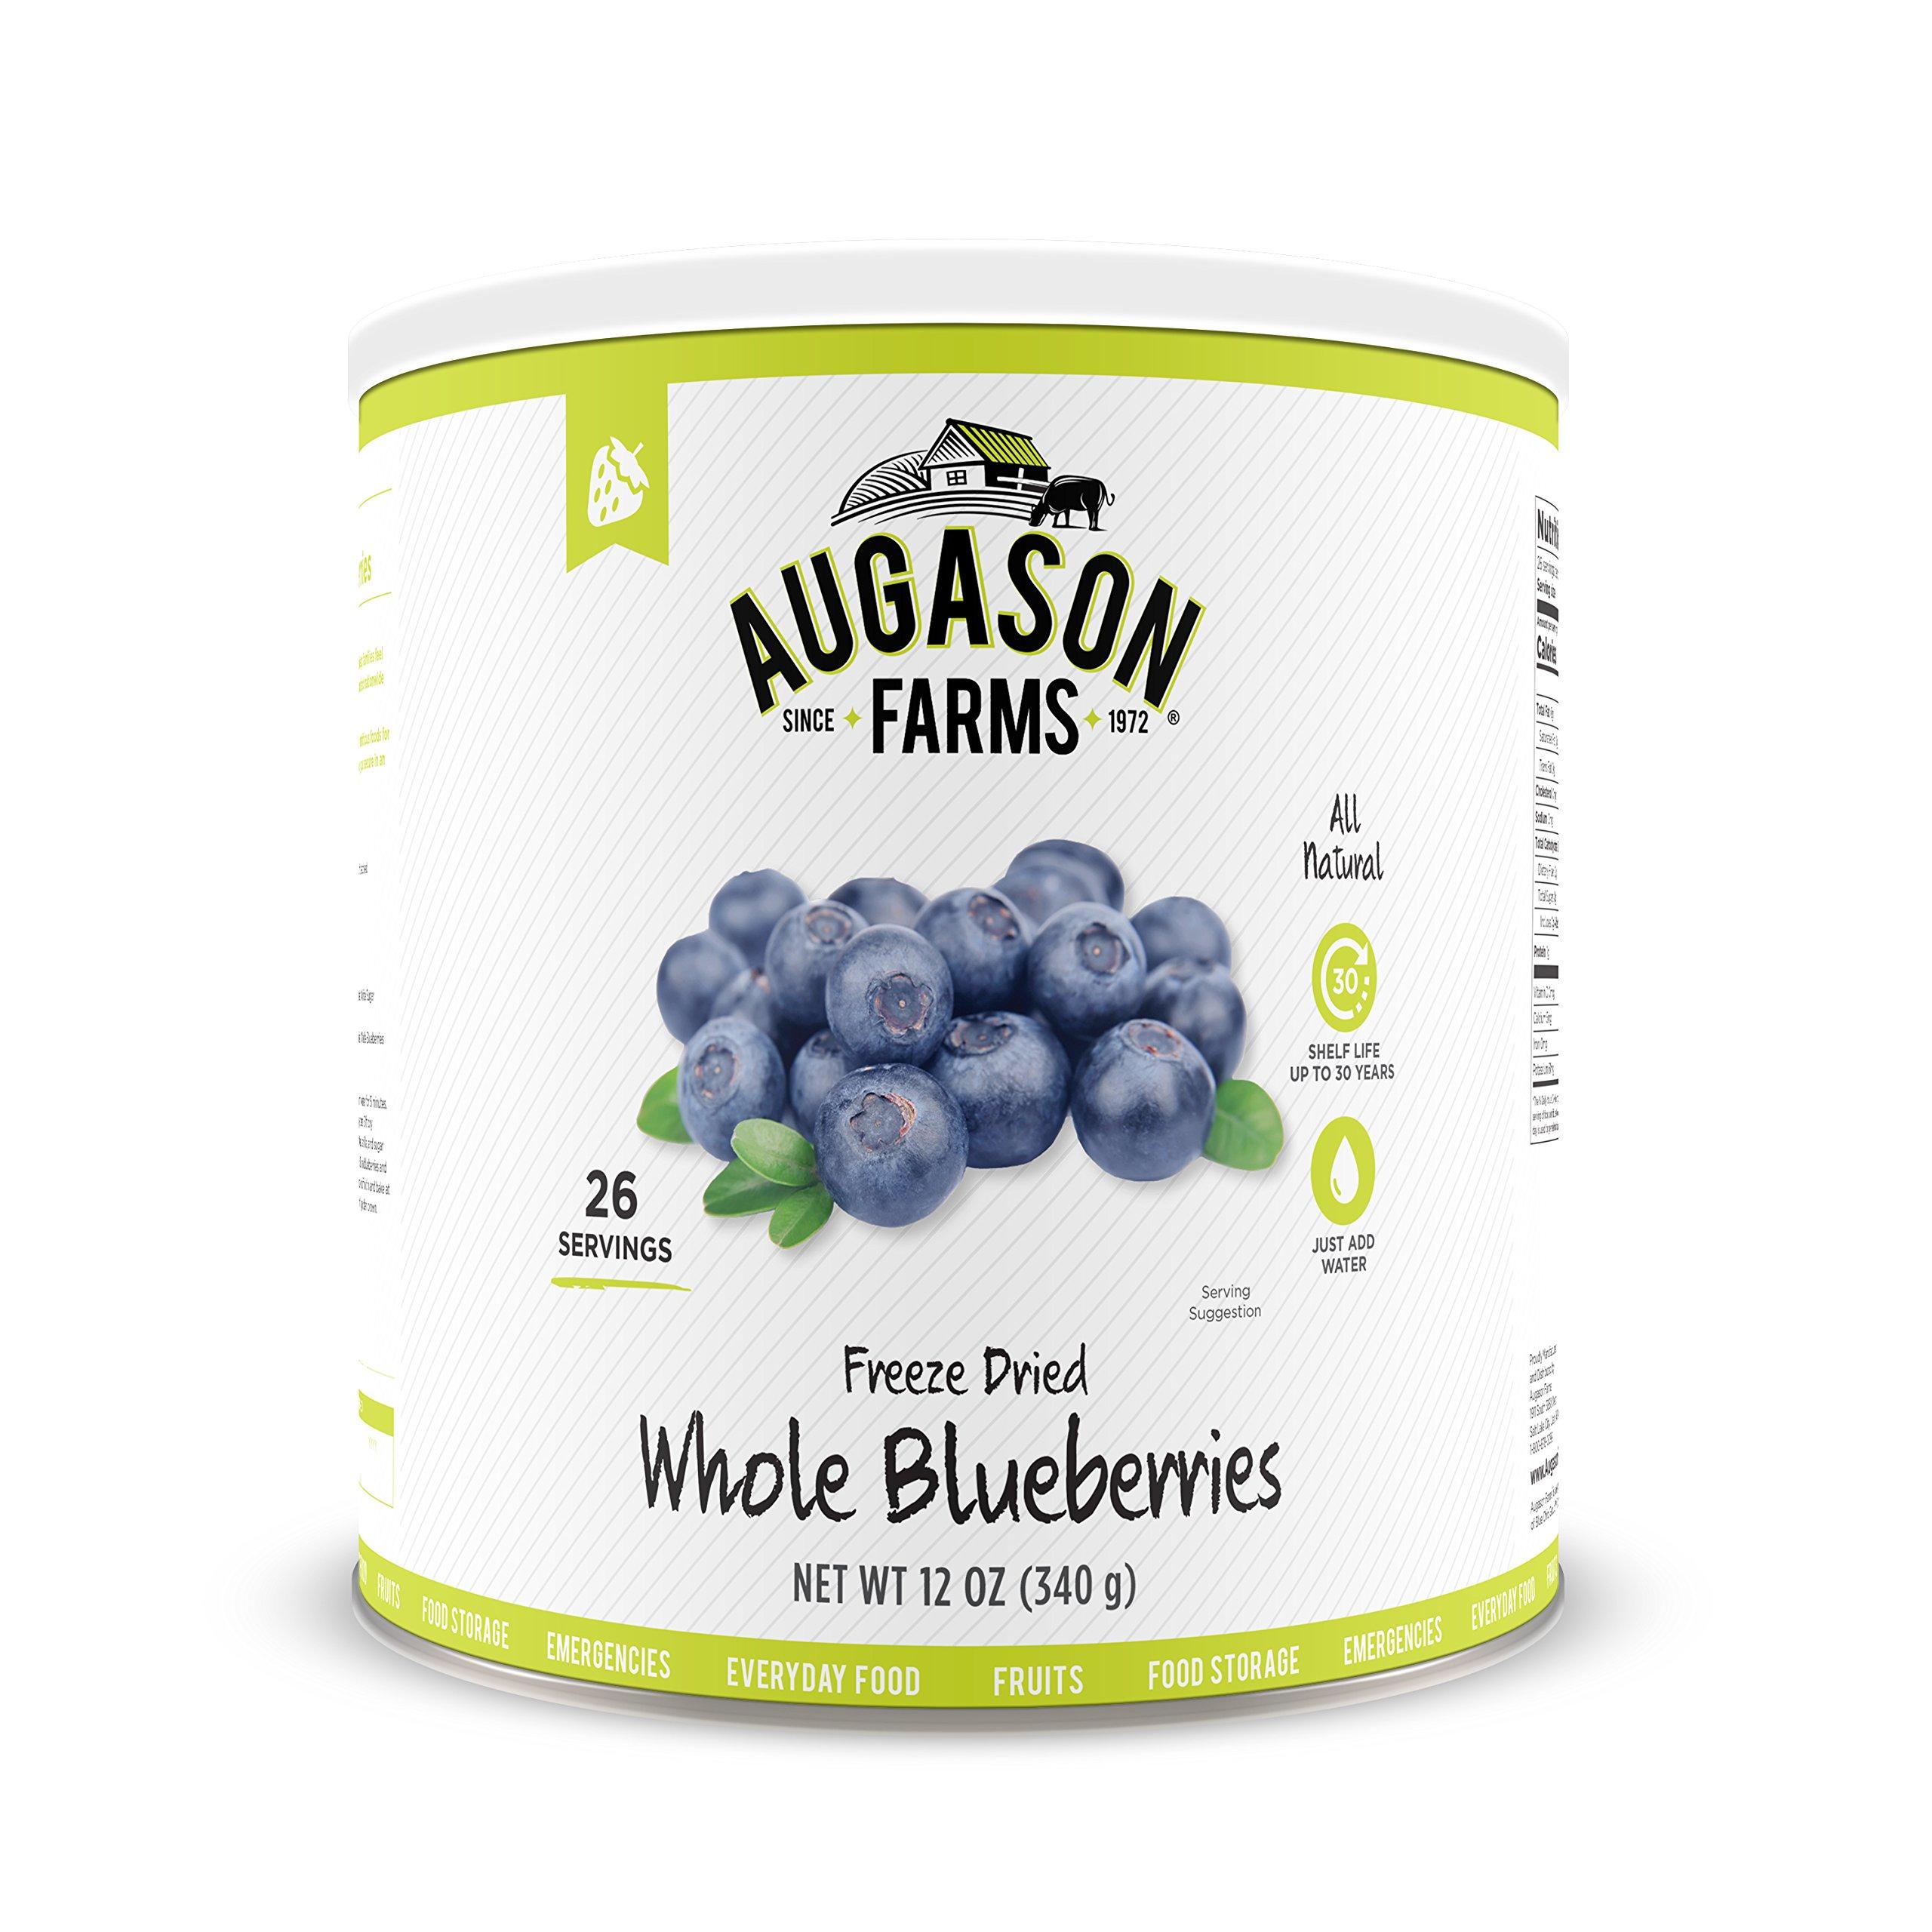 Augason Farms Freeze Dried Whole Blueberries 12 oz No. 10 Can by Augason Farms